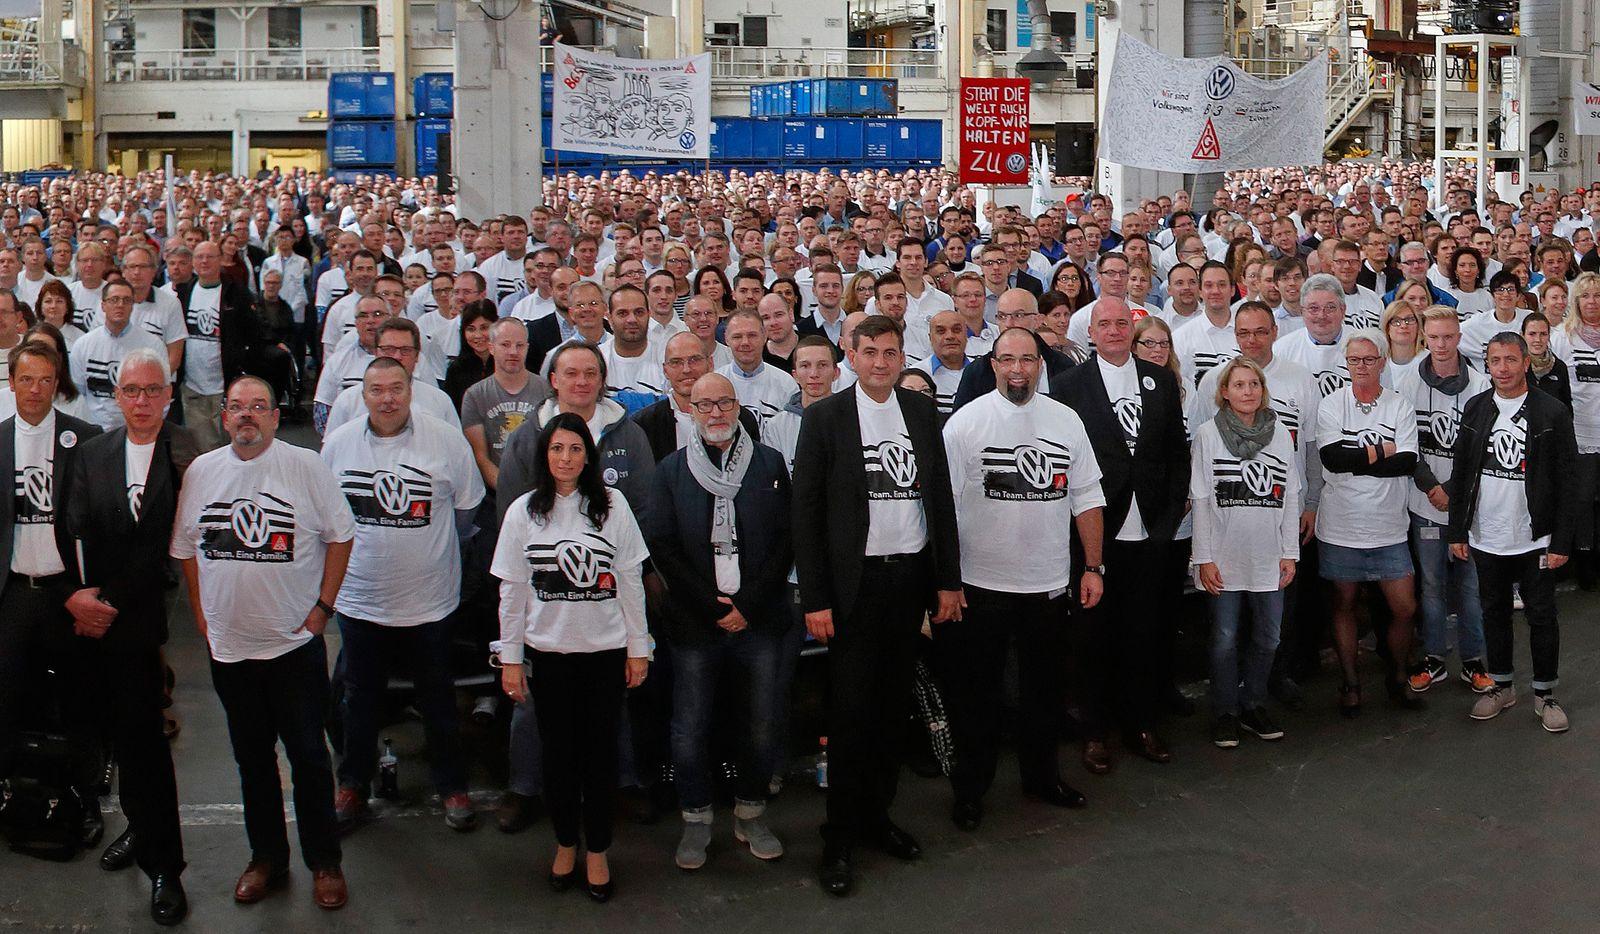 Betriebsversammlung VW / Volkswagen